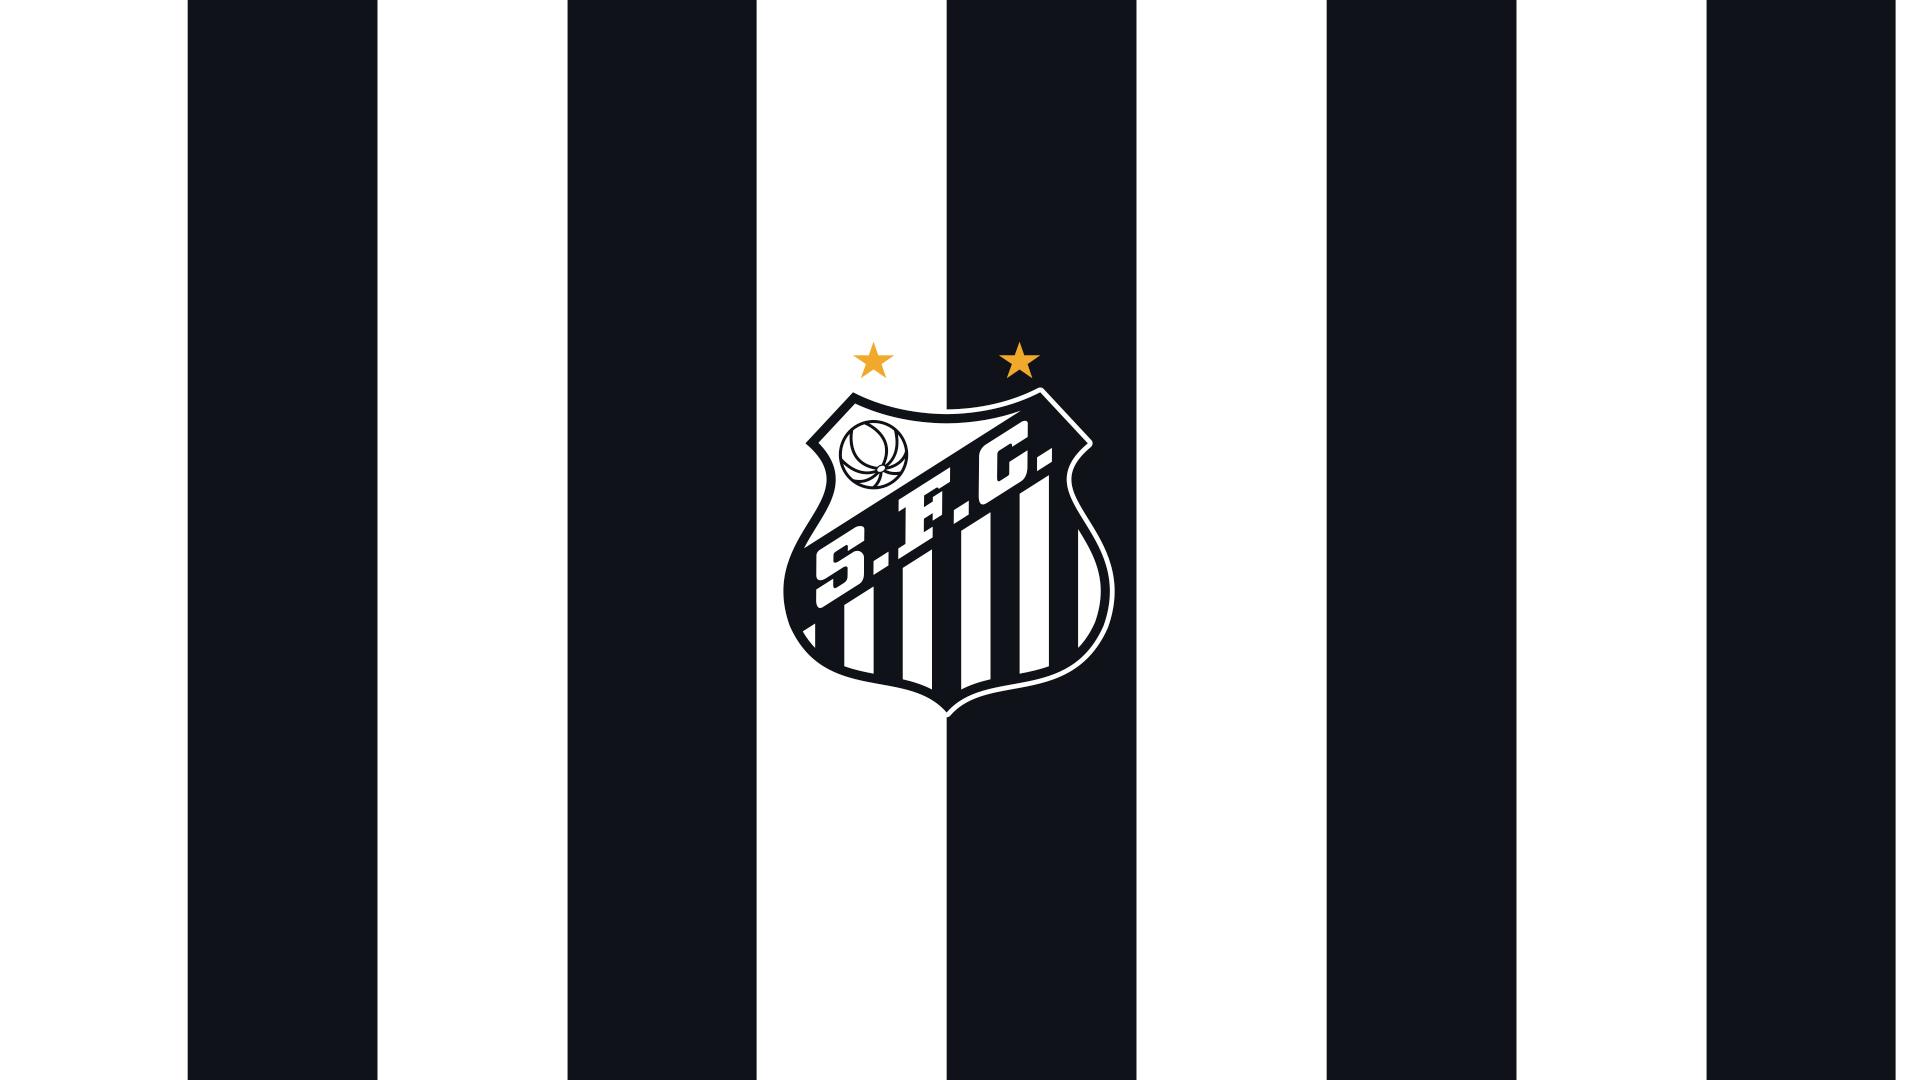 Best 50 Santos Wallpaper on HipWallpaper Santos Futebol Clube 1920x1080